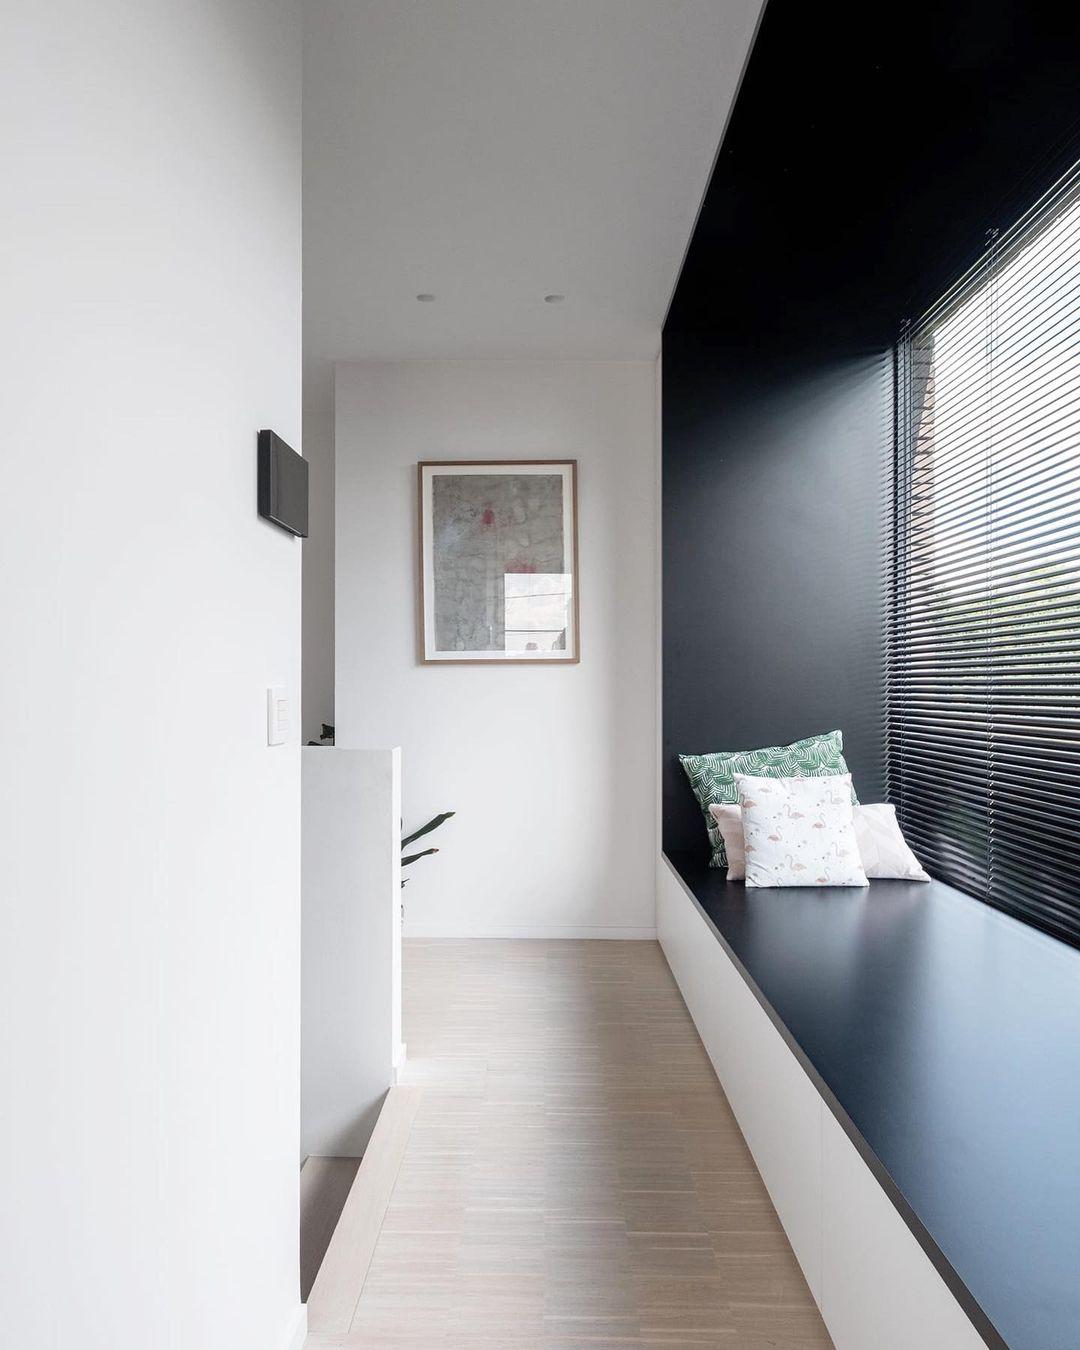 2019 09 | Baeyens & Beck architecten Gent | architect nieuwbouw renovatie interieur | high end | architectenbureau